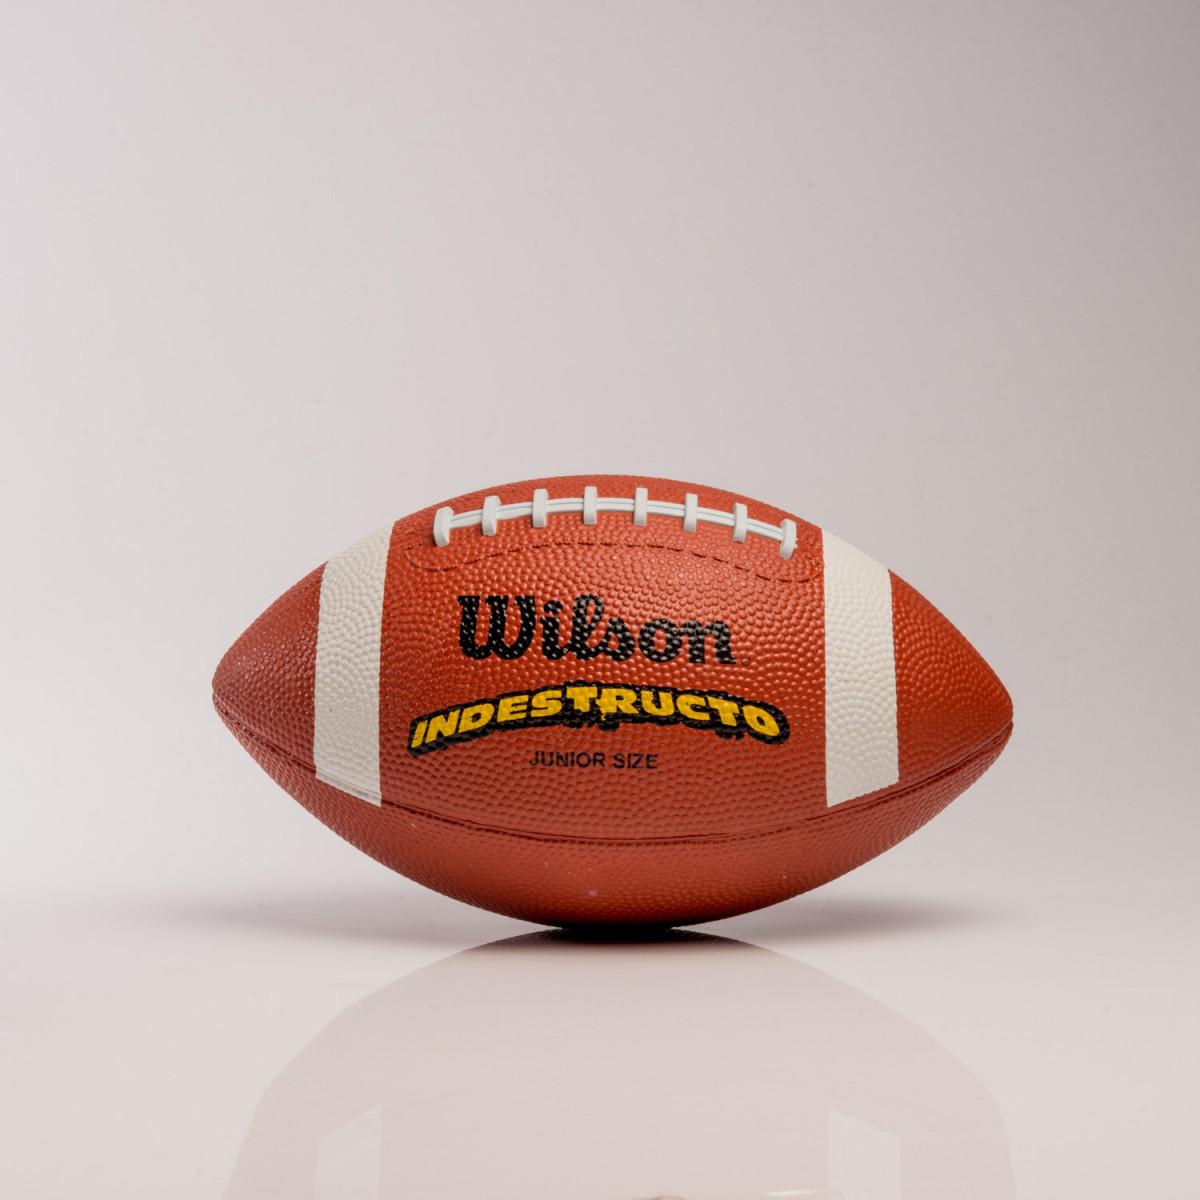 PELOTA WILSON TN JR FOOTBALL